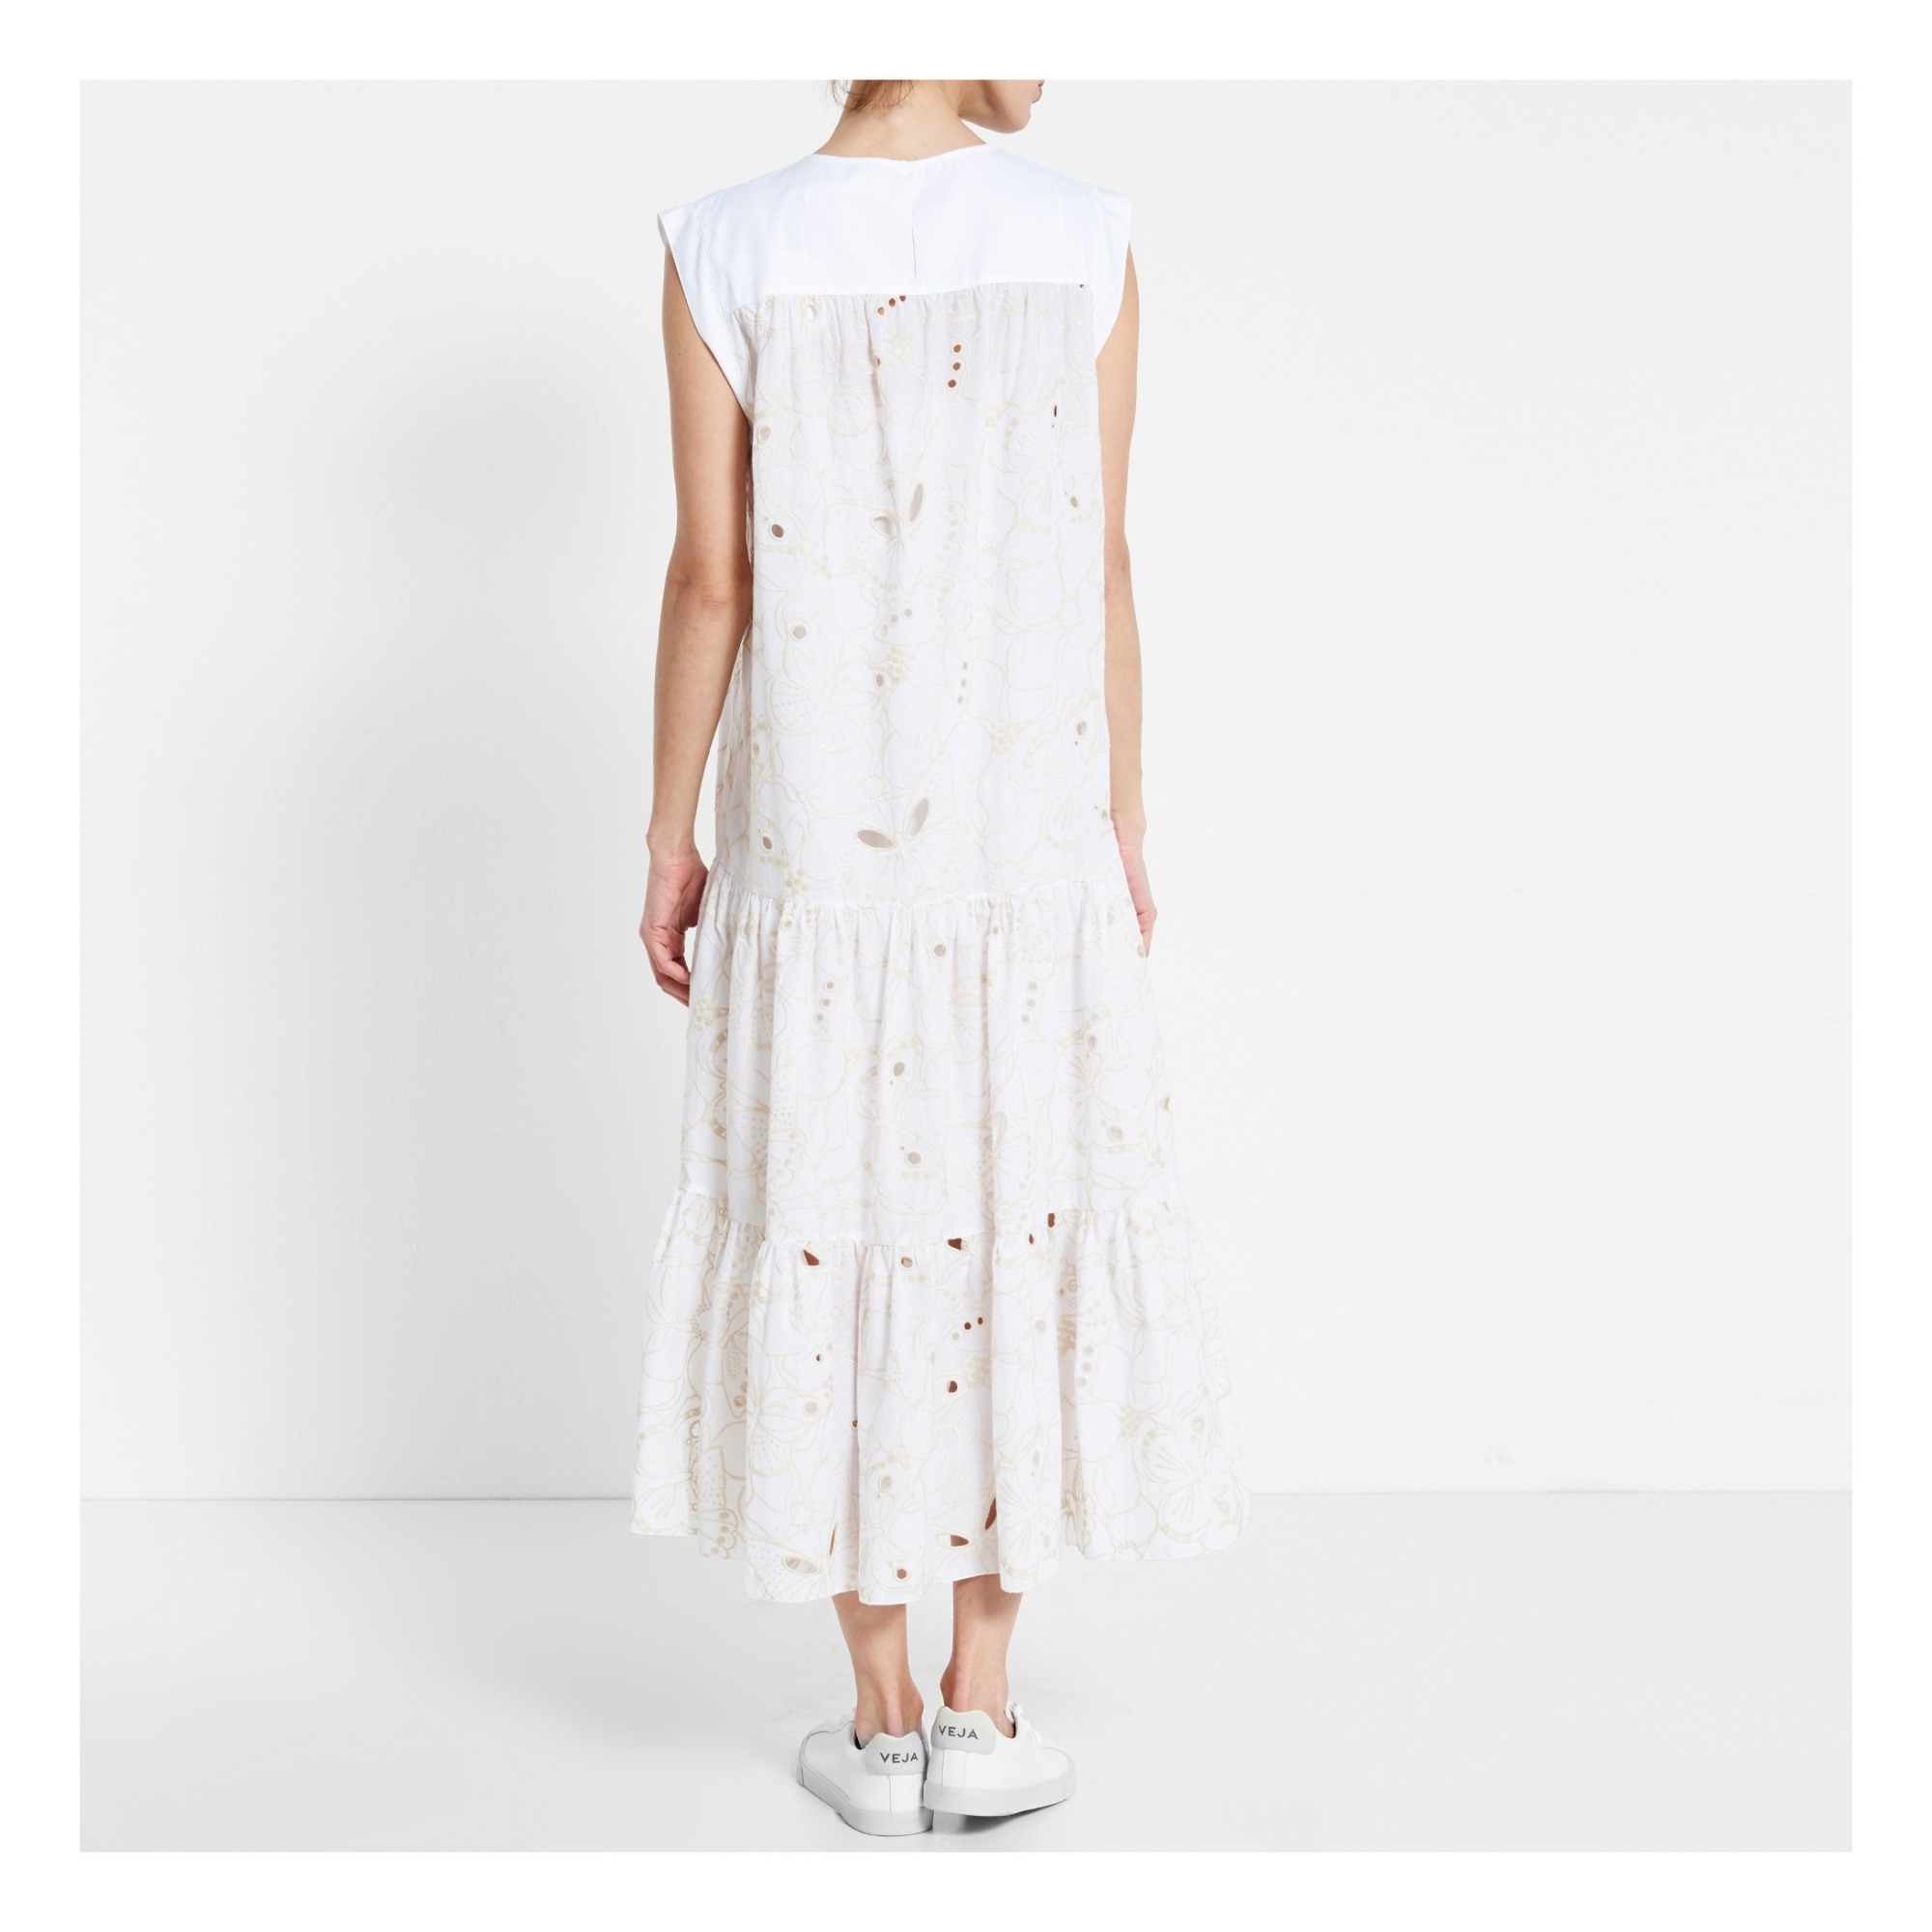 Kleid Weiß Seechloé Mode Erwachsene